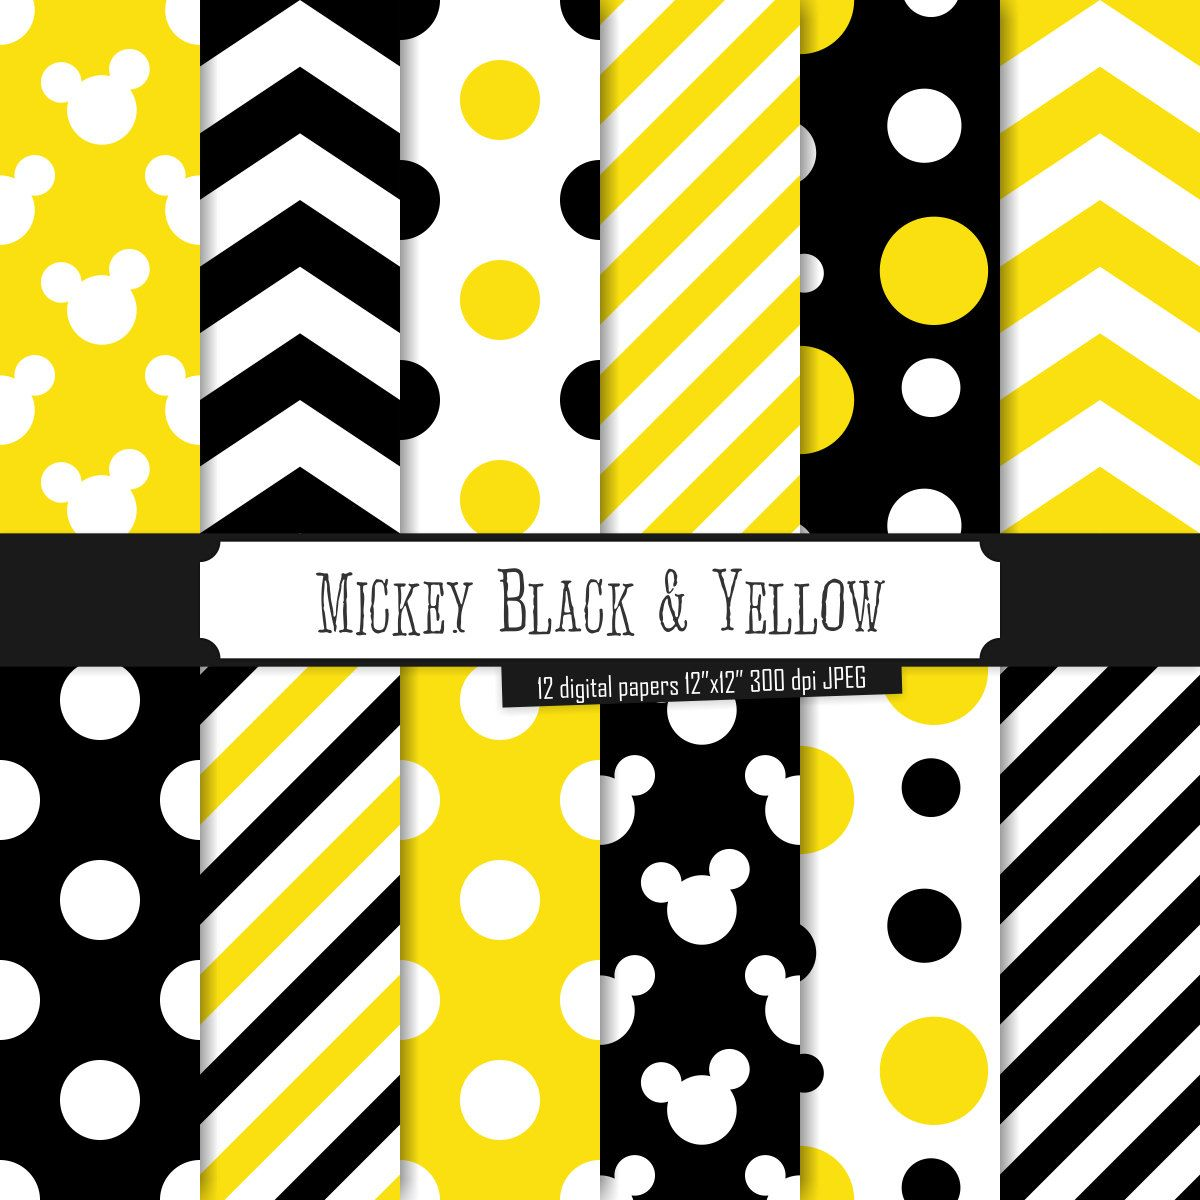 Buy 2 Get 1 Free! Digital Paper Mickey Black & Yellow